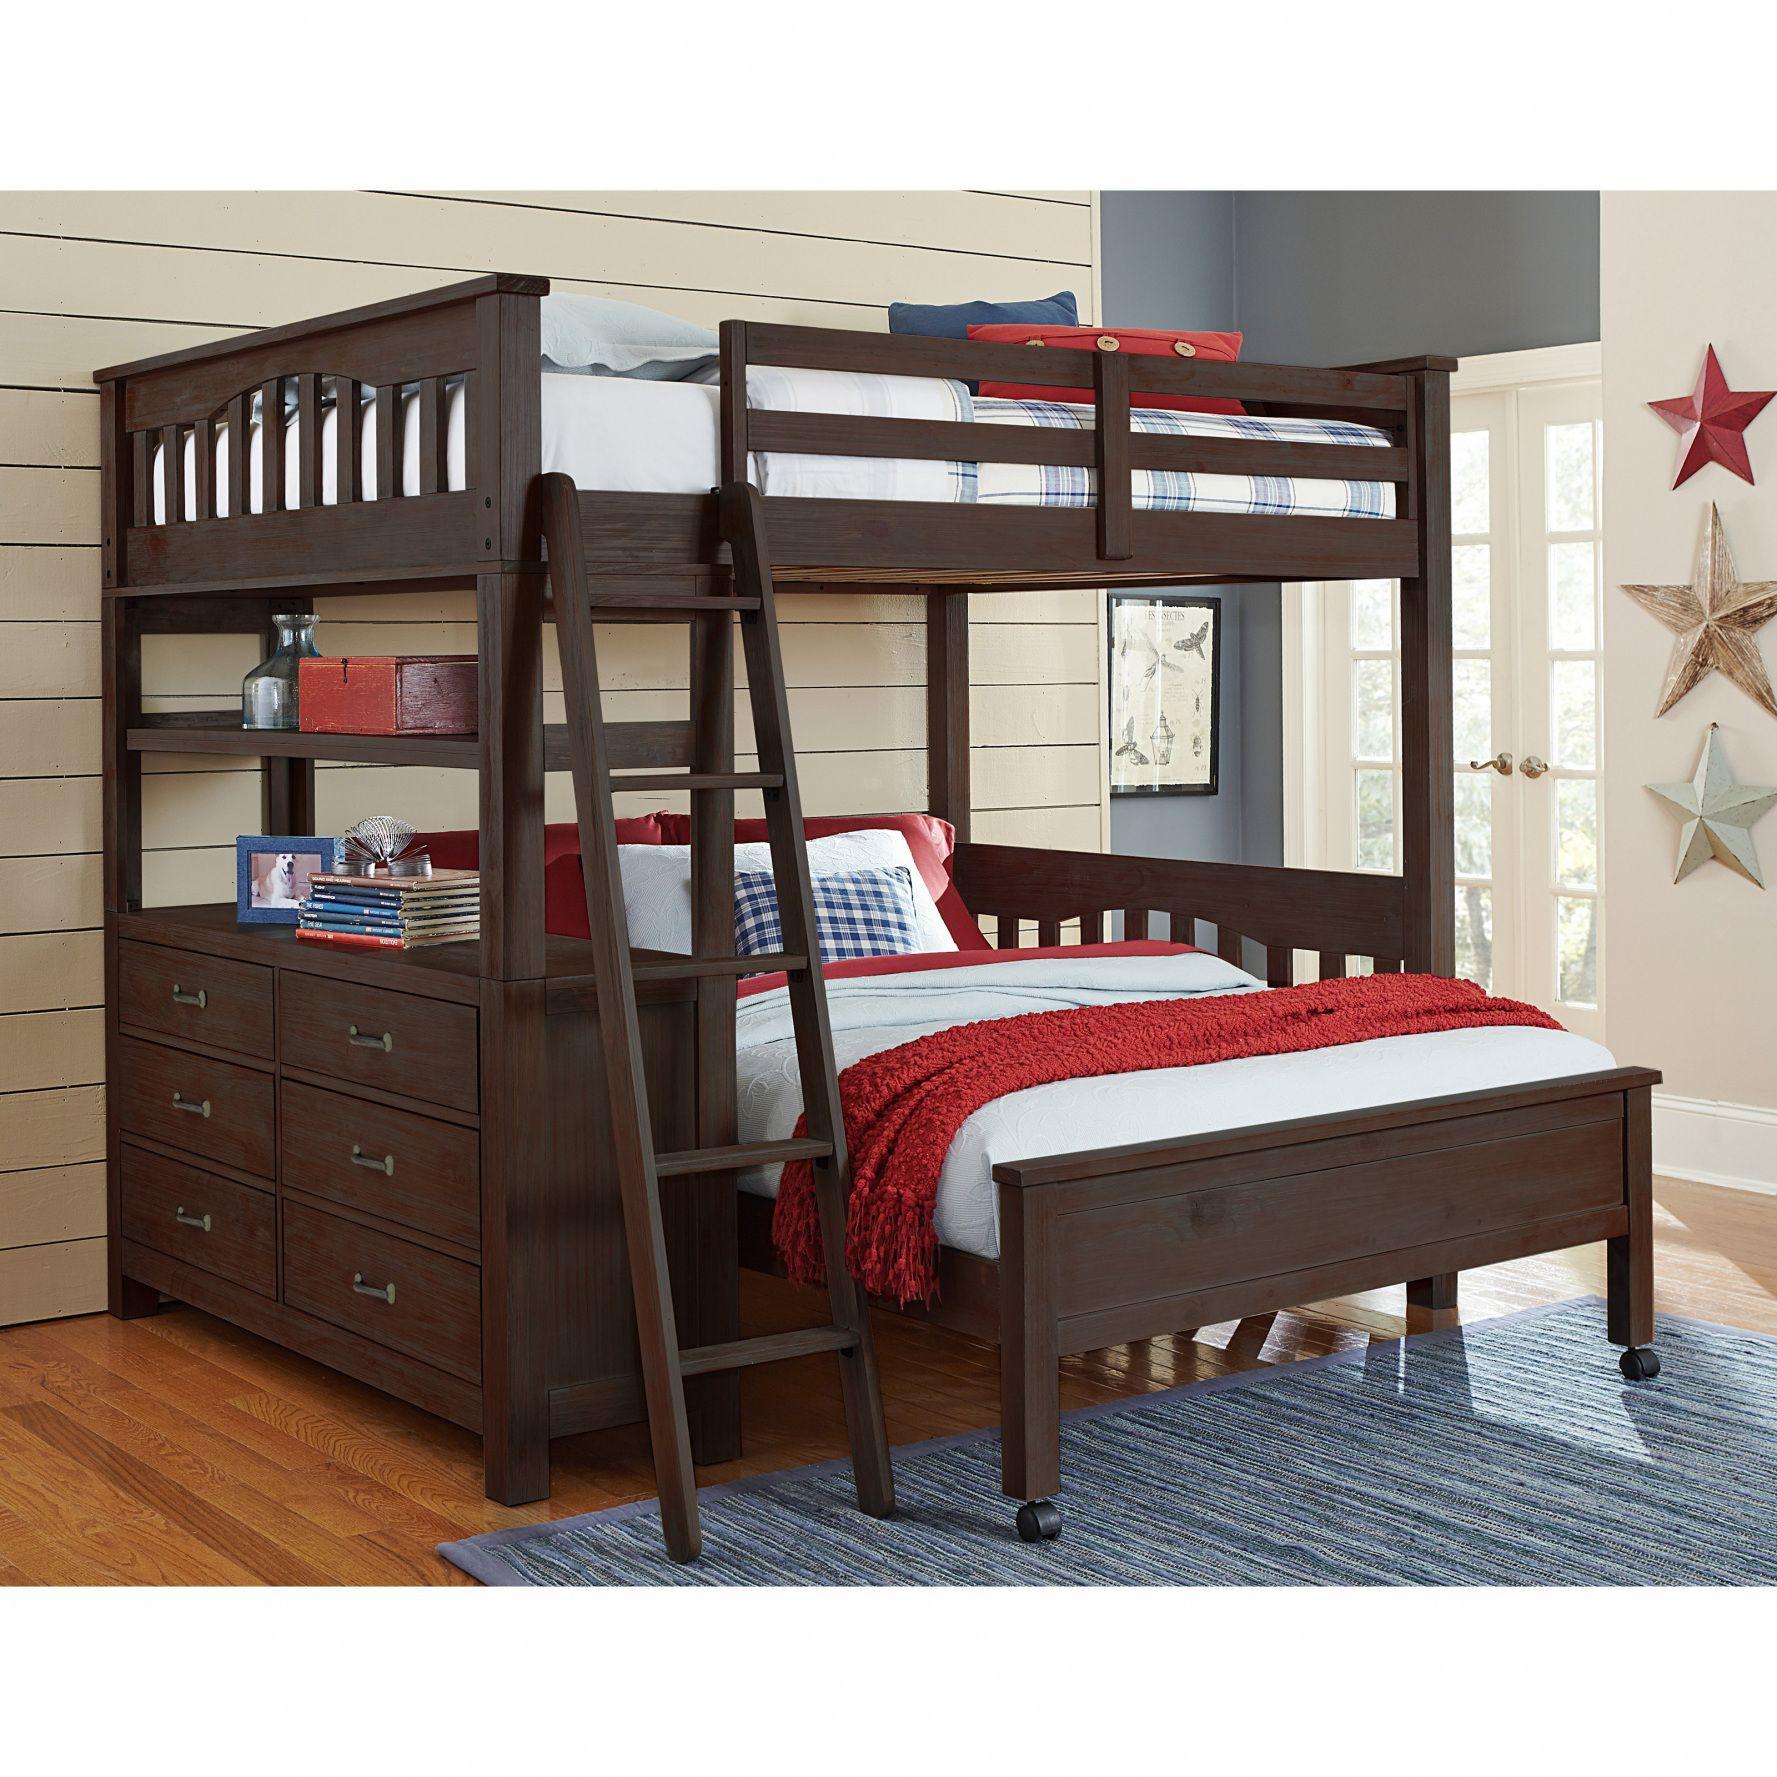 Loft over bedroom   Full Over Full Loft Bunk Beds  Simple Interior Design for